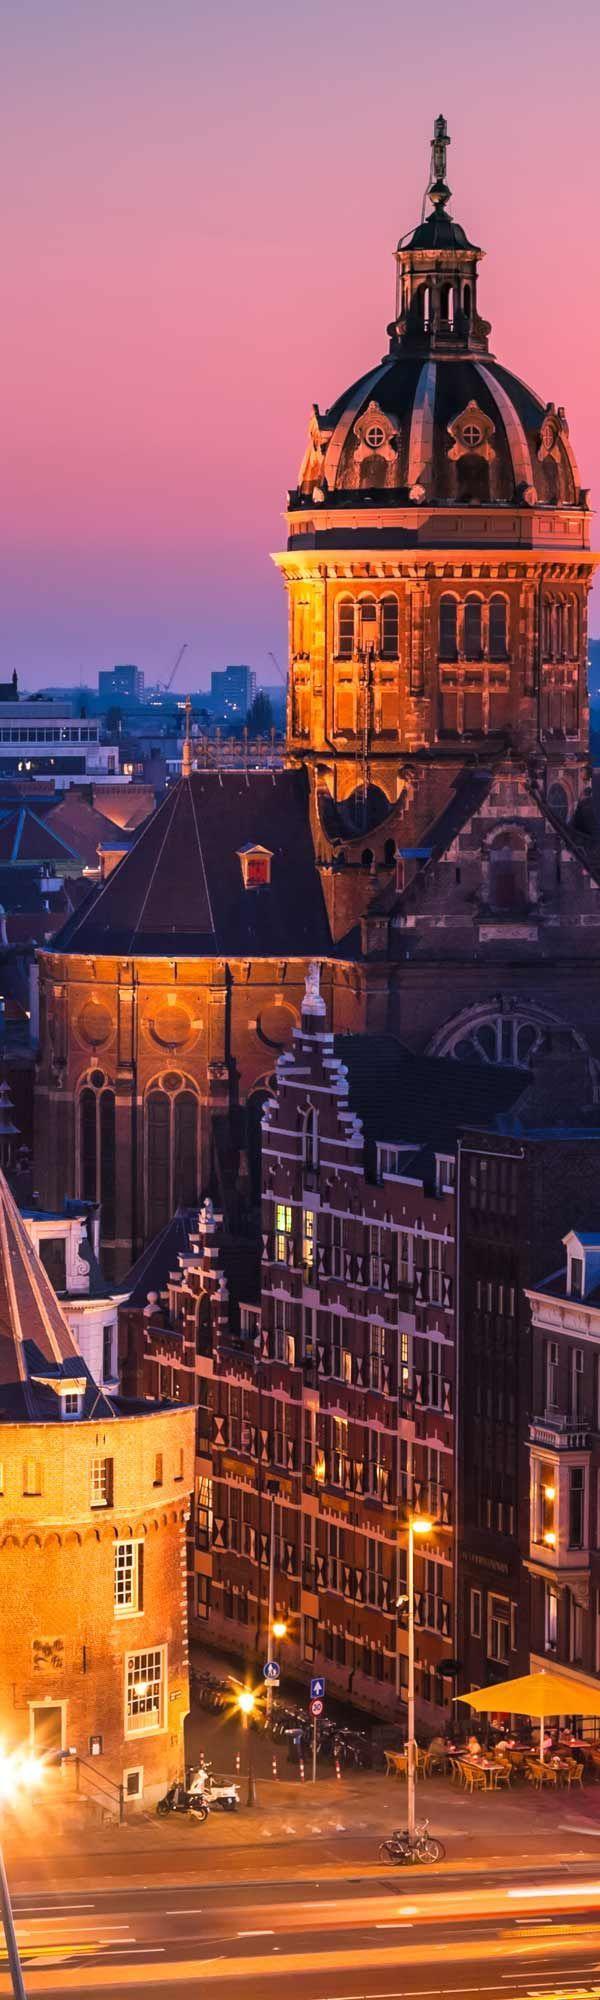 Helllloooo Amsterdam!